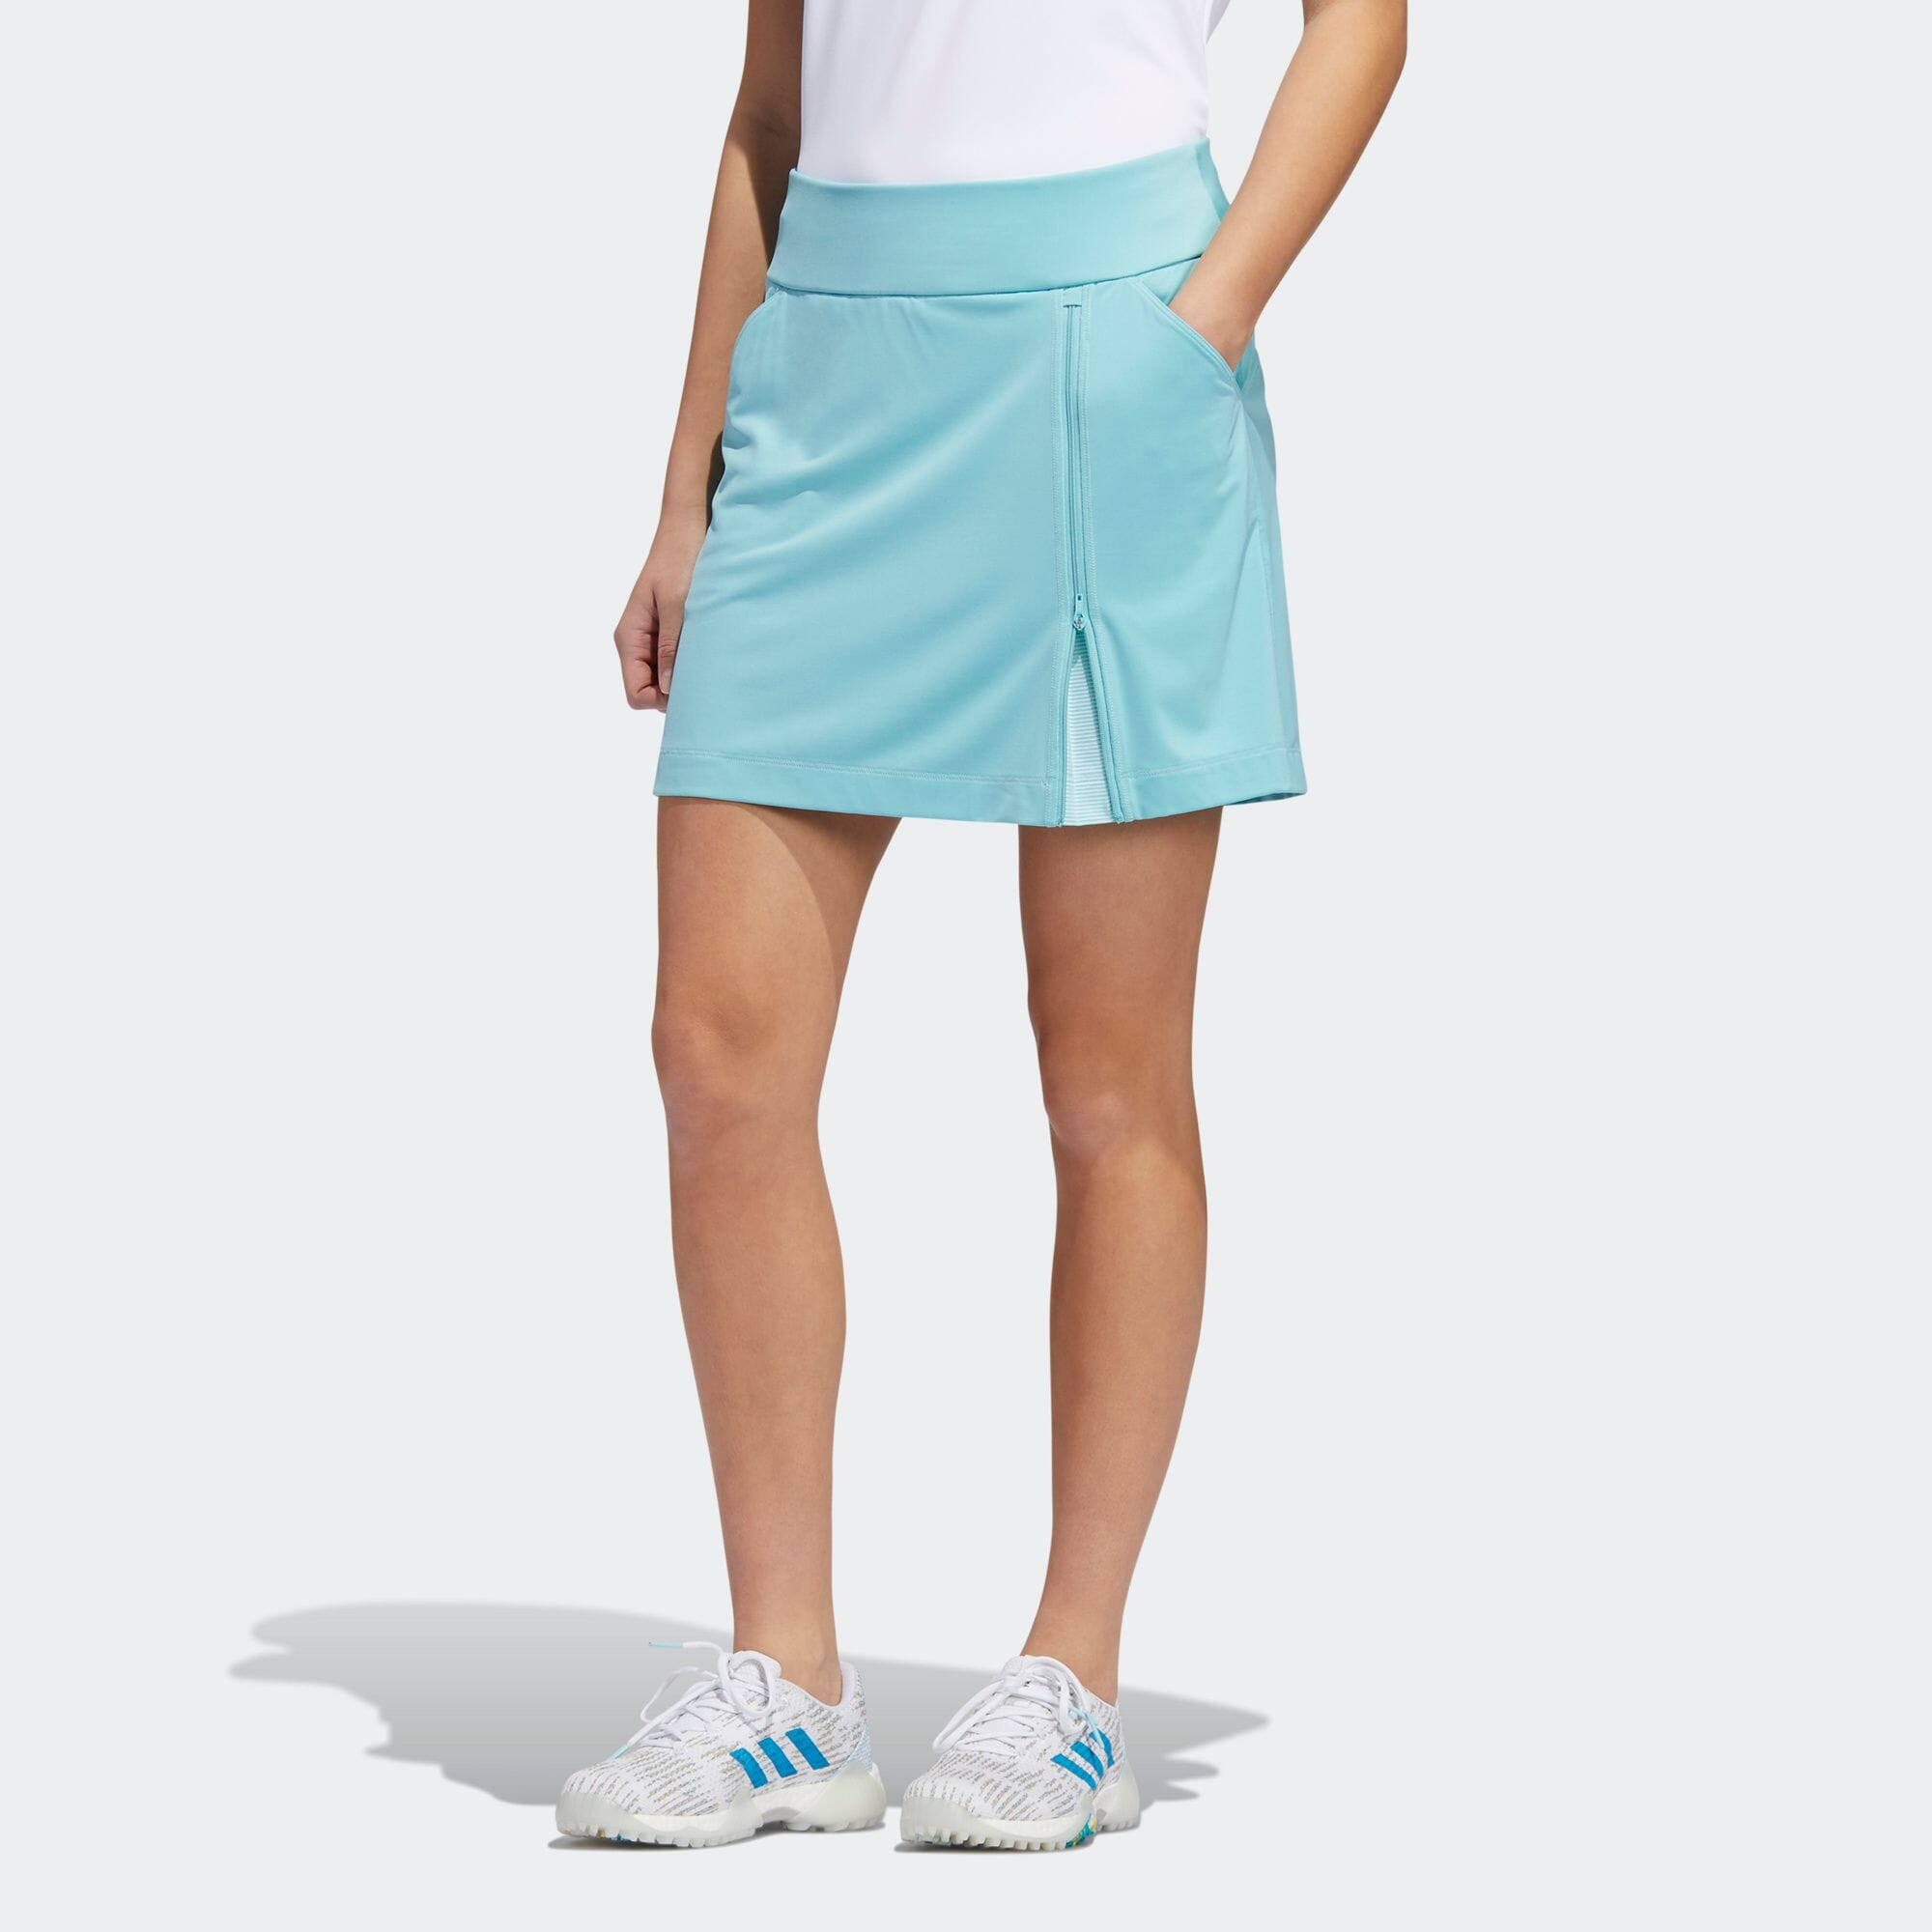 PRIME BLUE ストレッチスコート【ゴルフ】